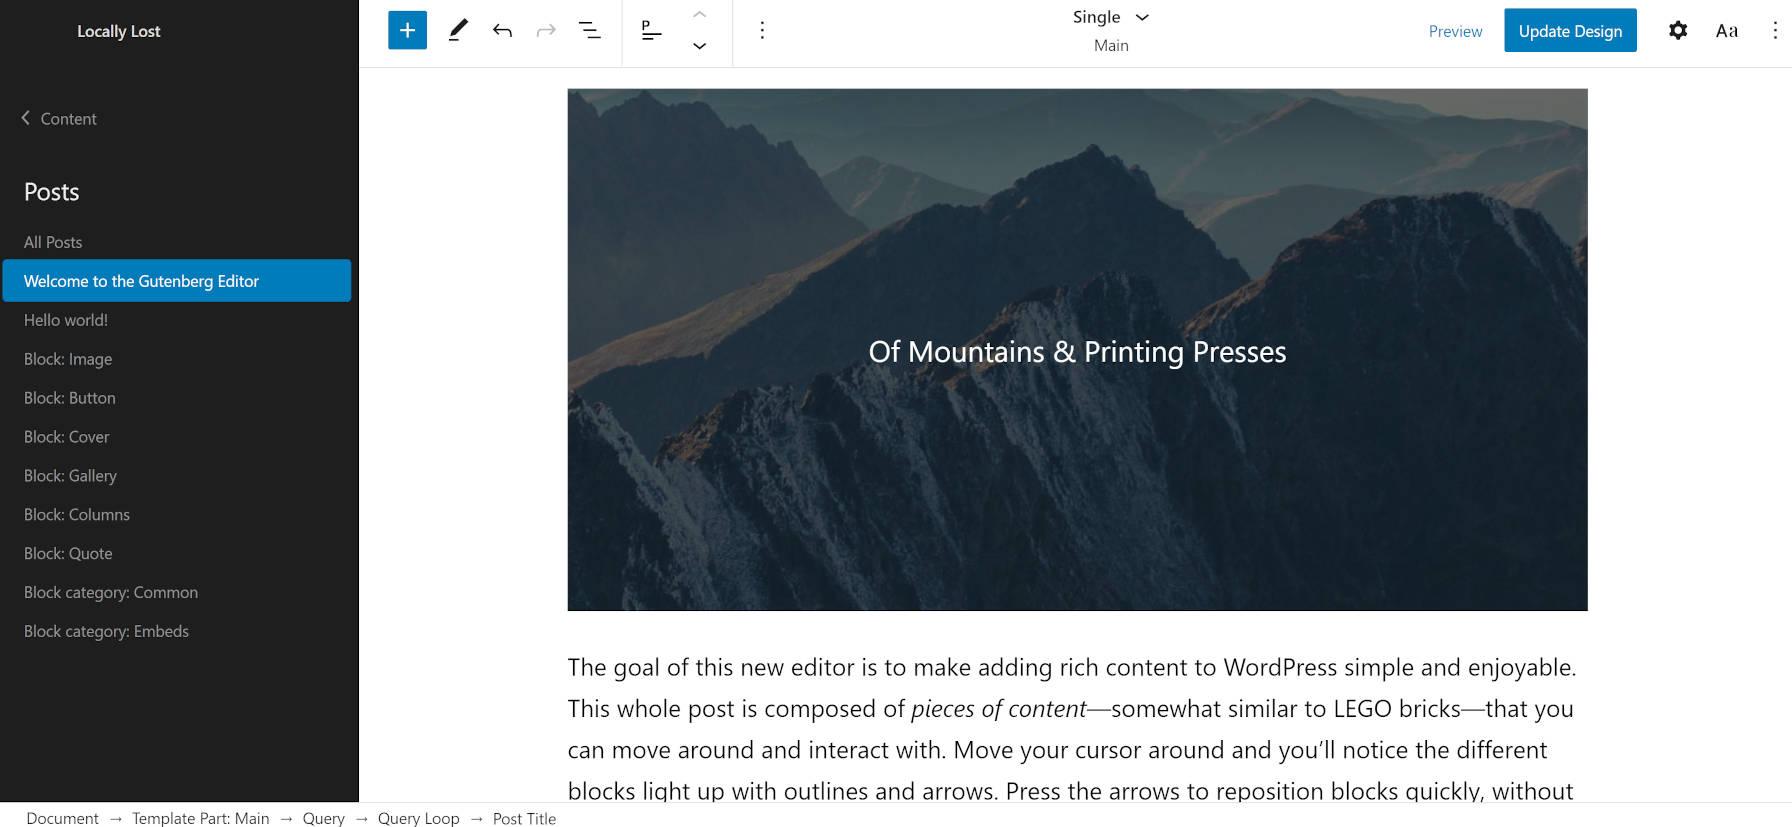 Armando WordPress主题可提供对全站点编辑当前状态的了解Armando WordPress主题可提供对全站点编辑当前状态的了解